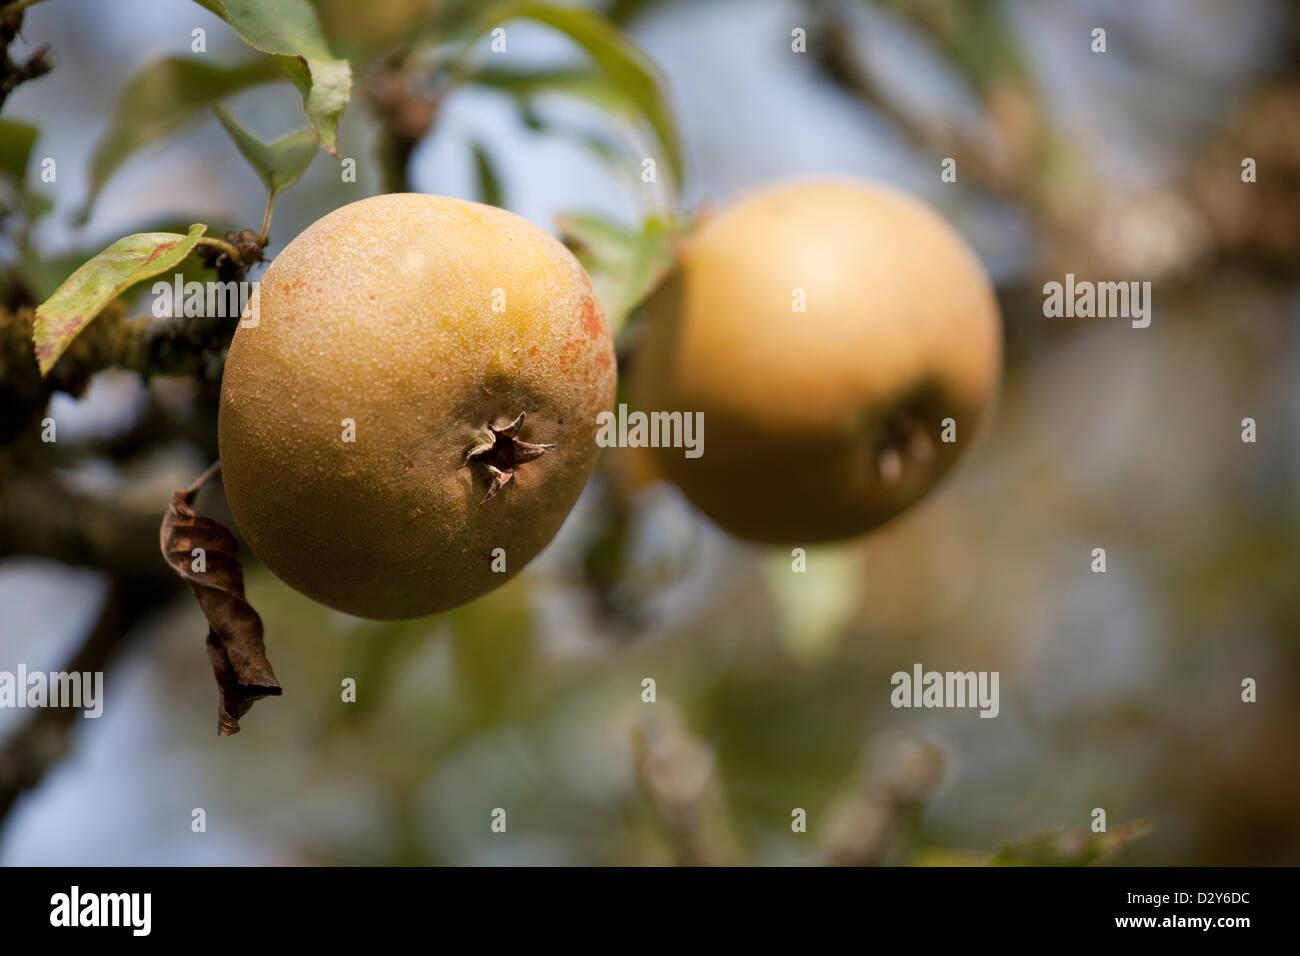 Malus domestica - Apple Egremont Russet - Stock Image